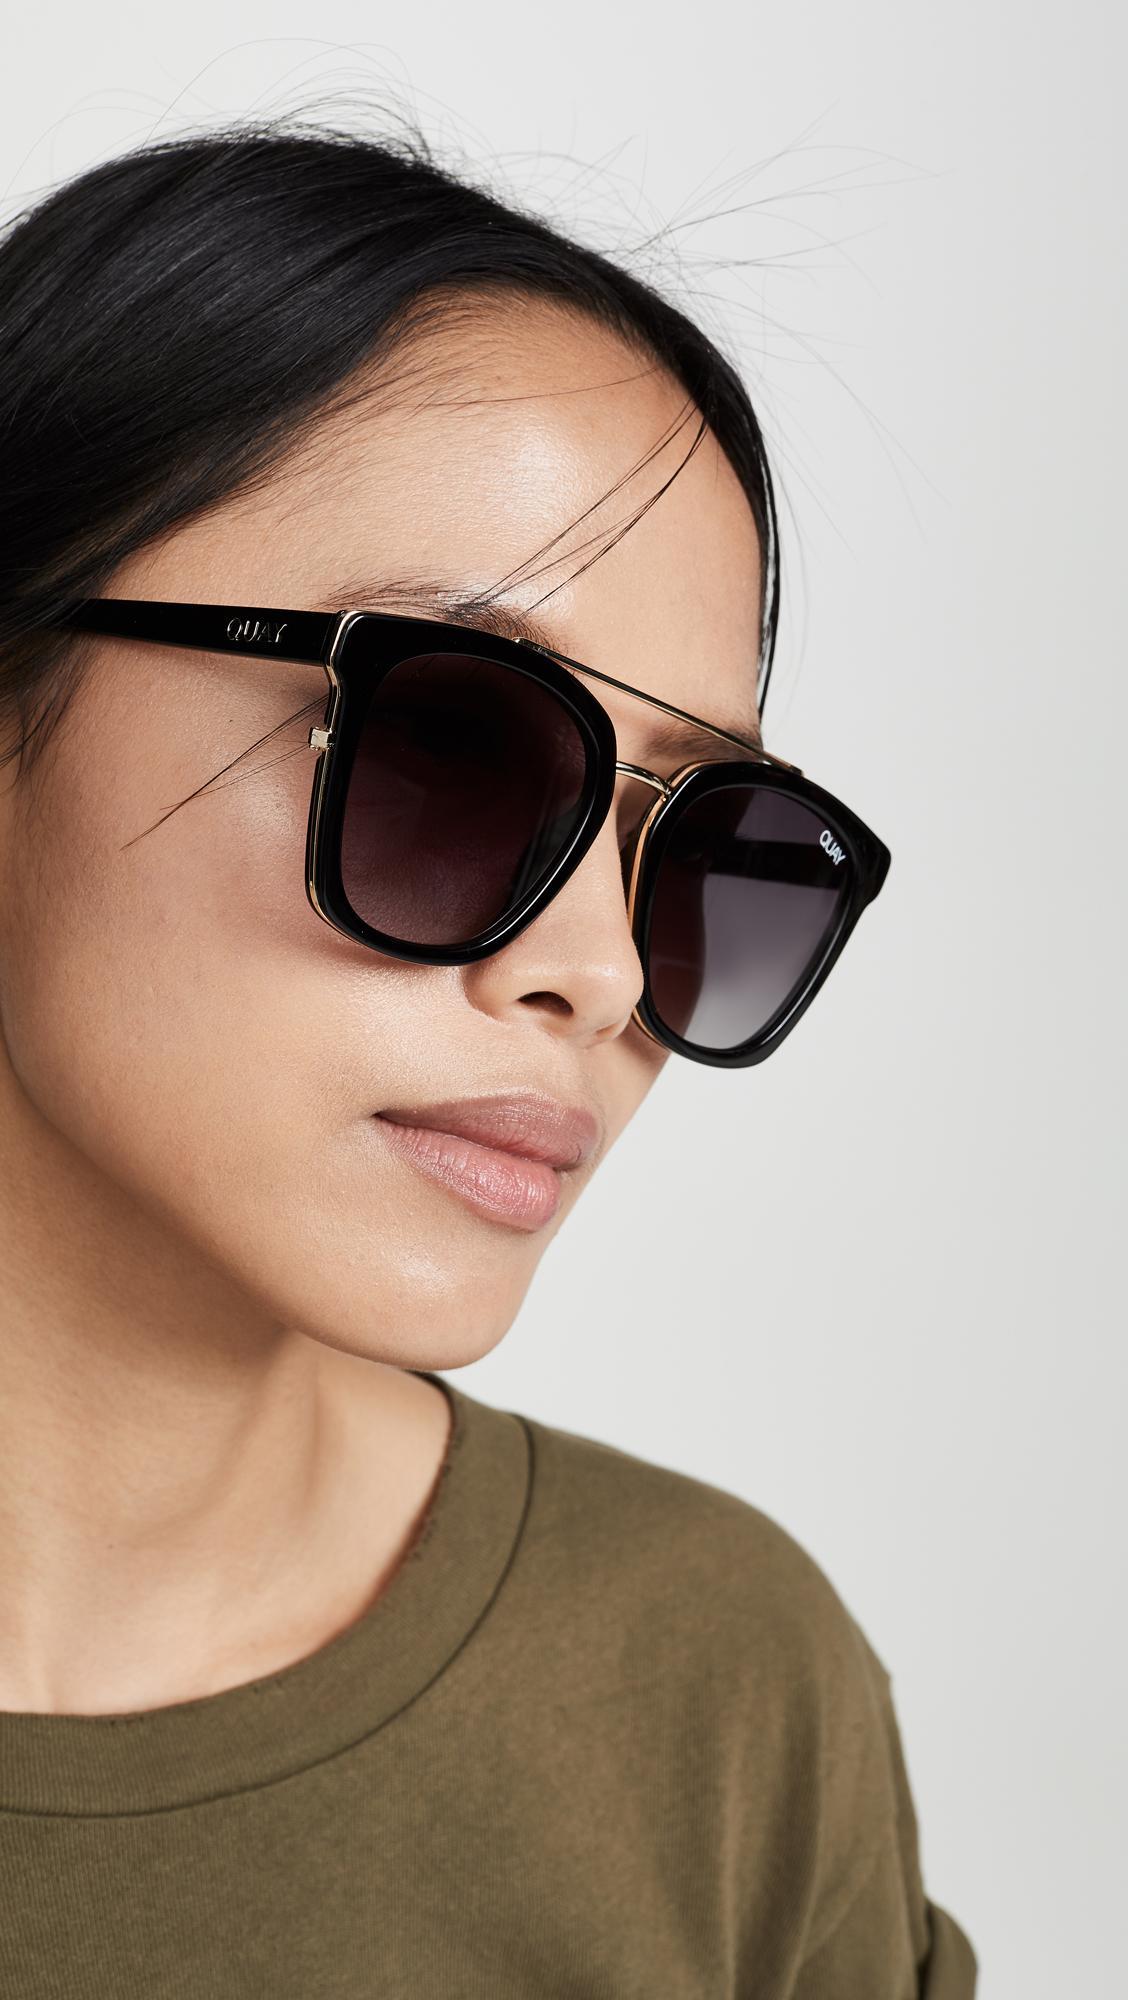 Quay Sweet Dreams Sunglasses in Black - Lyst